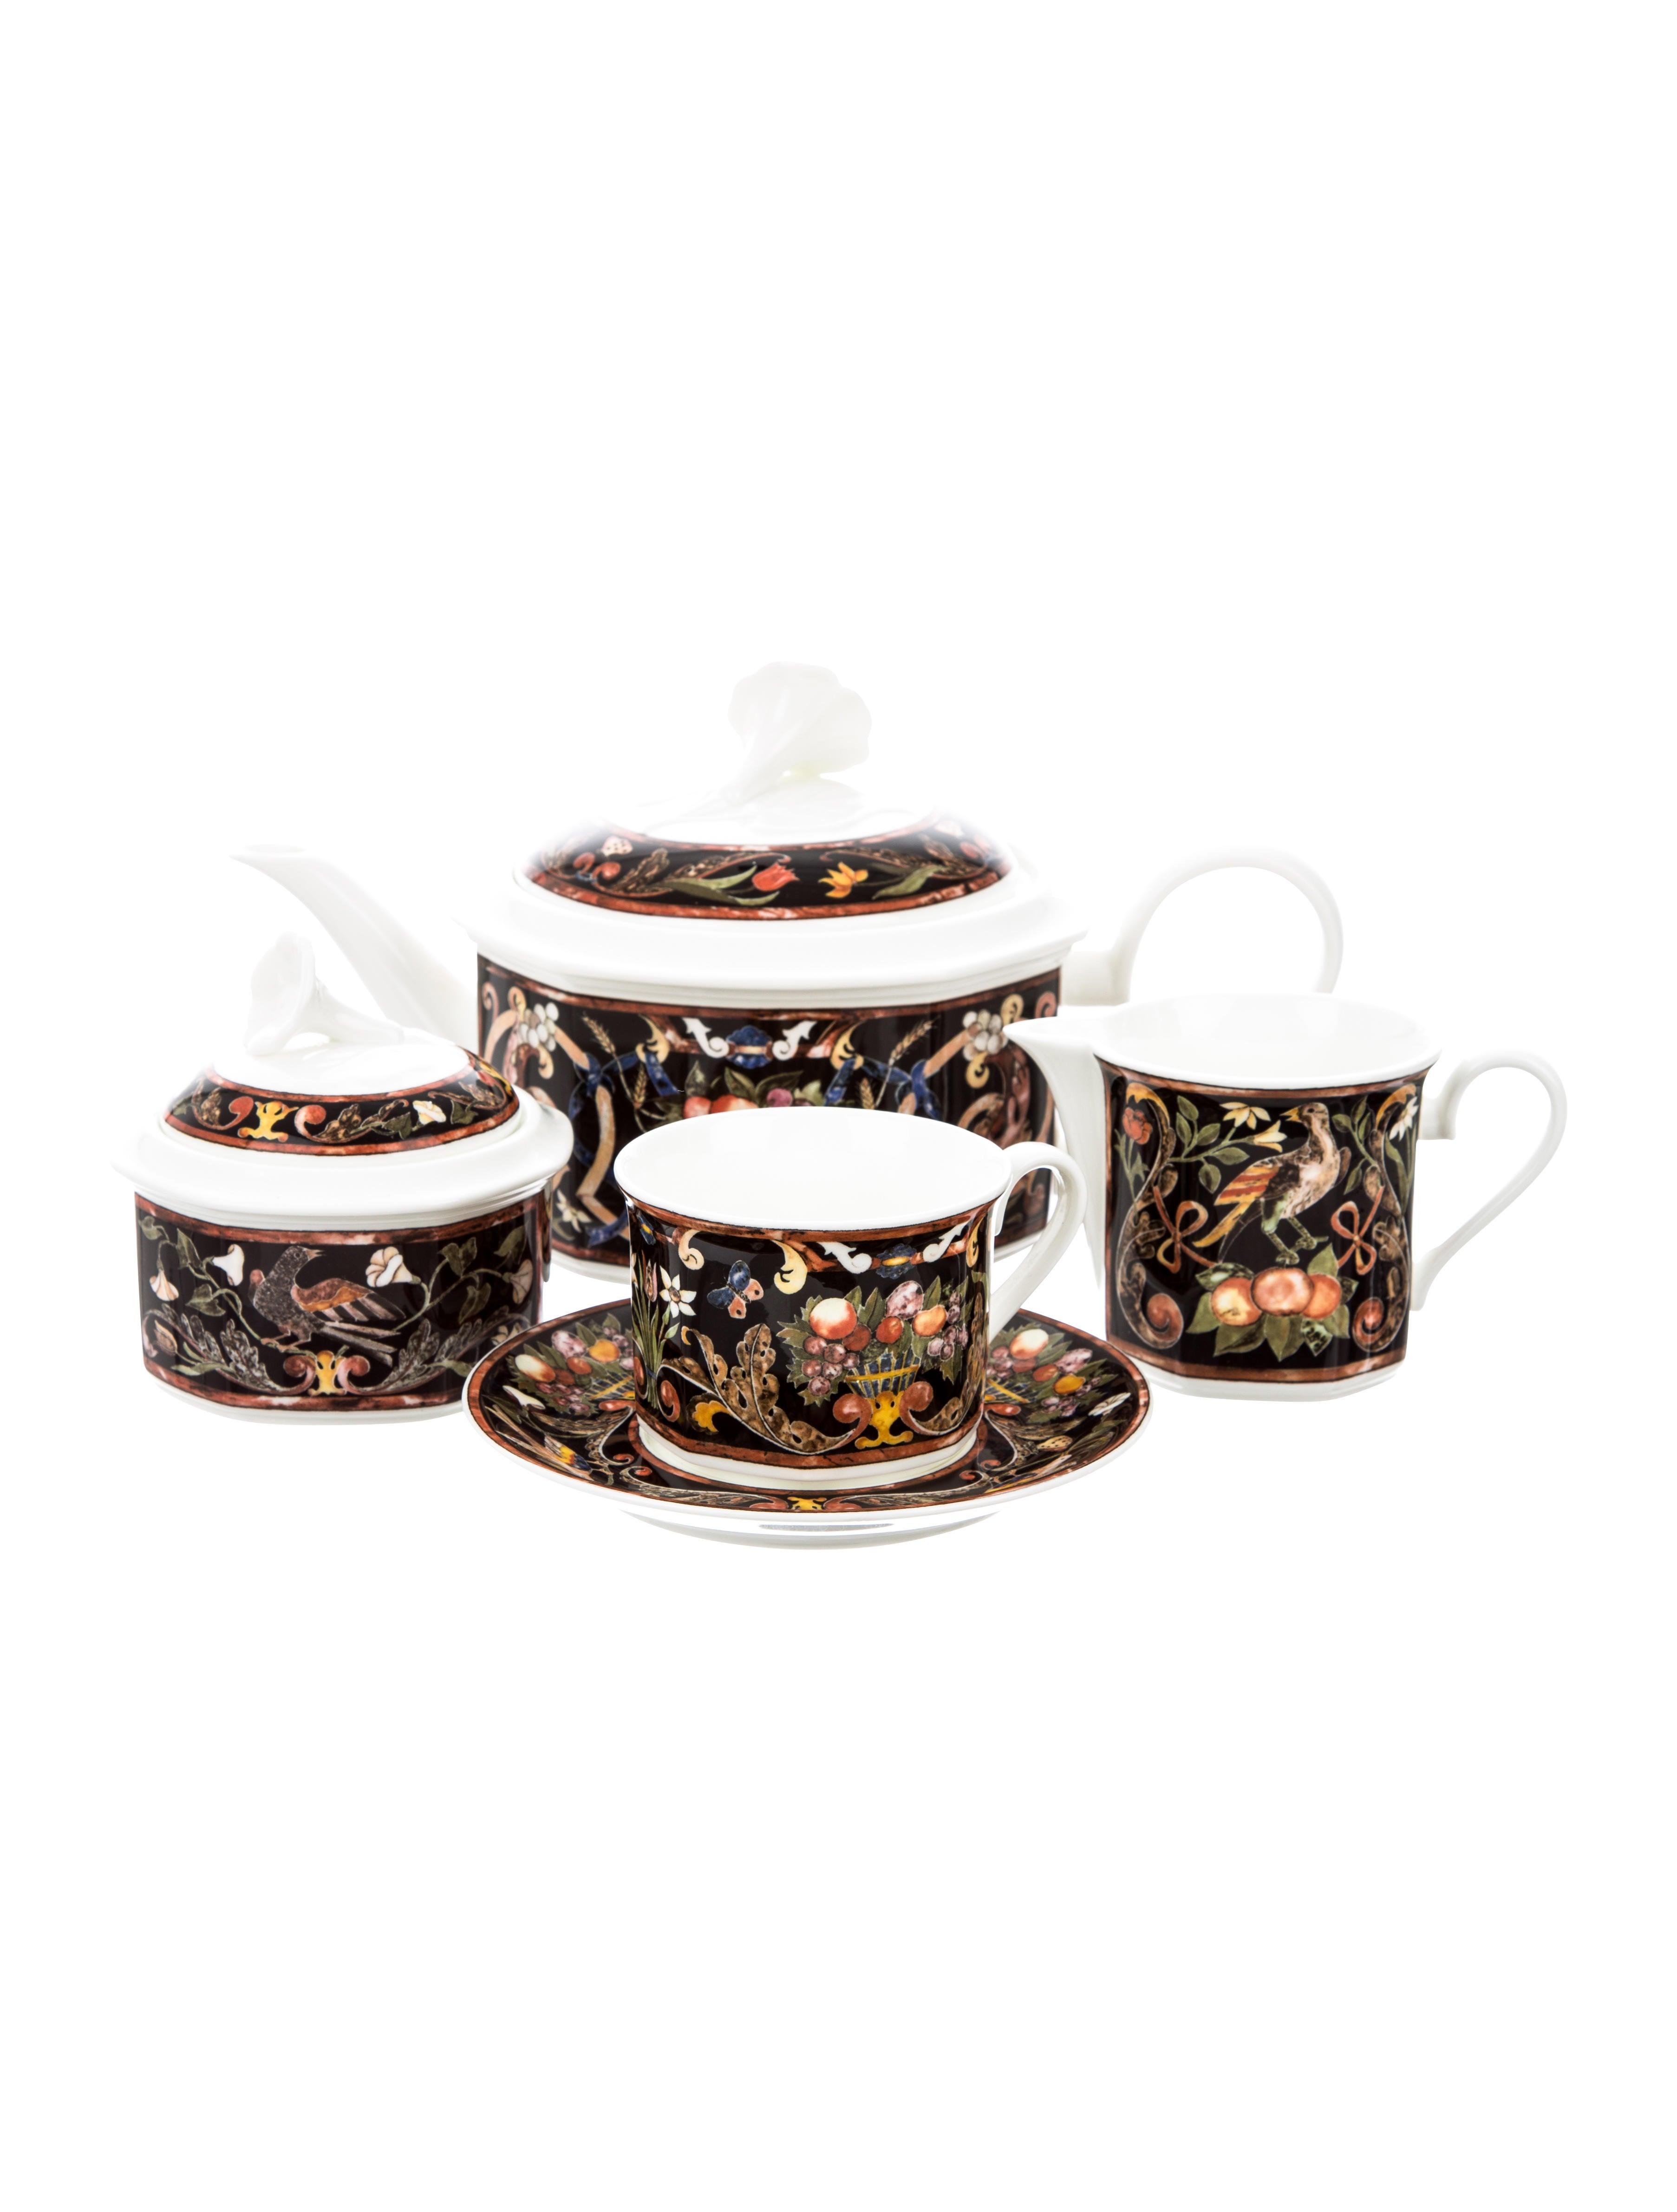 tableware villeroy boch intarsia tea service tabletop and kitchen tware20699 the realreal. Black Bedroom Furniture Sets. Home Design Ideas